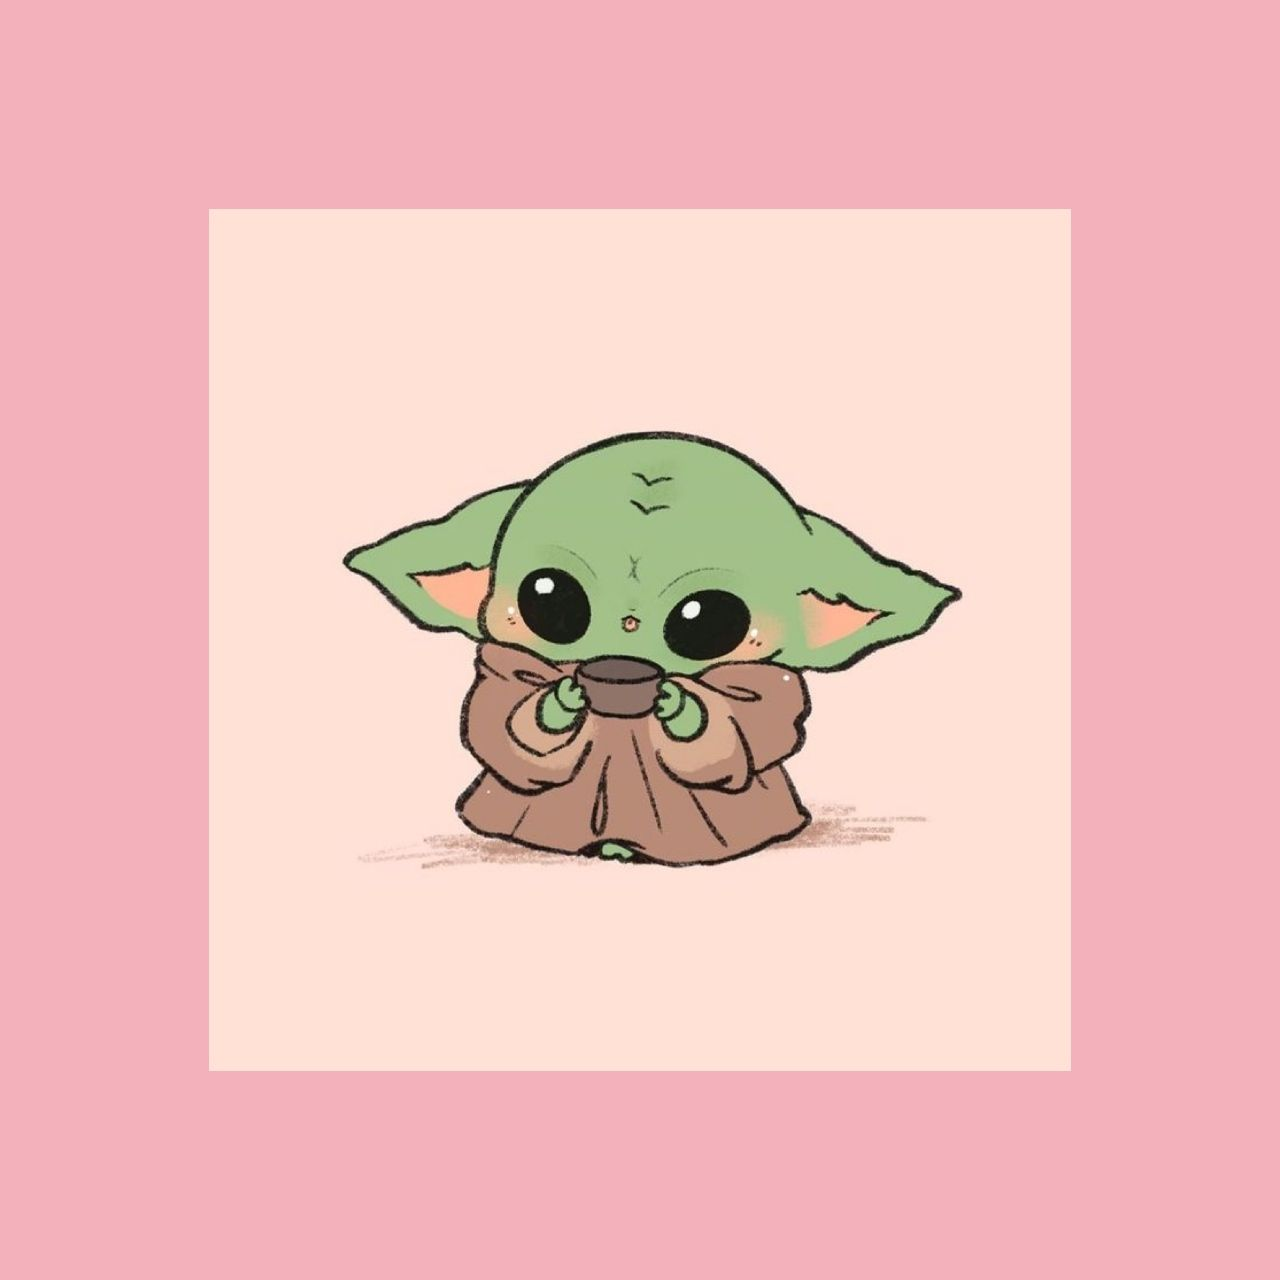 Pink Baby Yoda Yoda Wallpaper Cute Cartoon Wallpapers Yoda Drawing